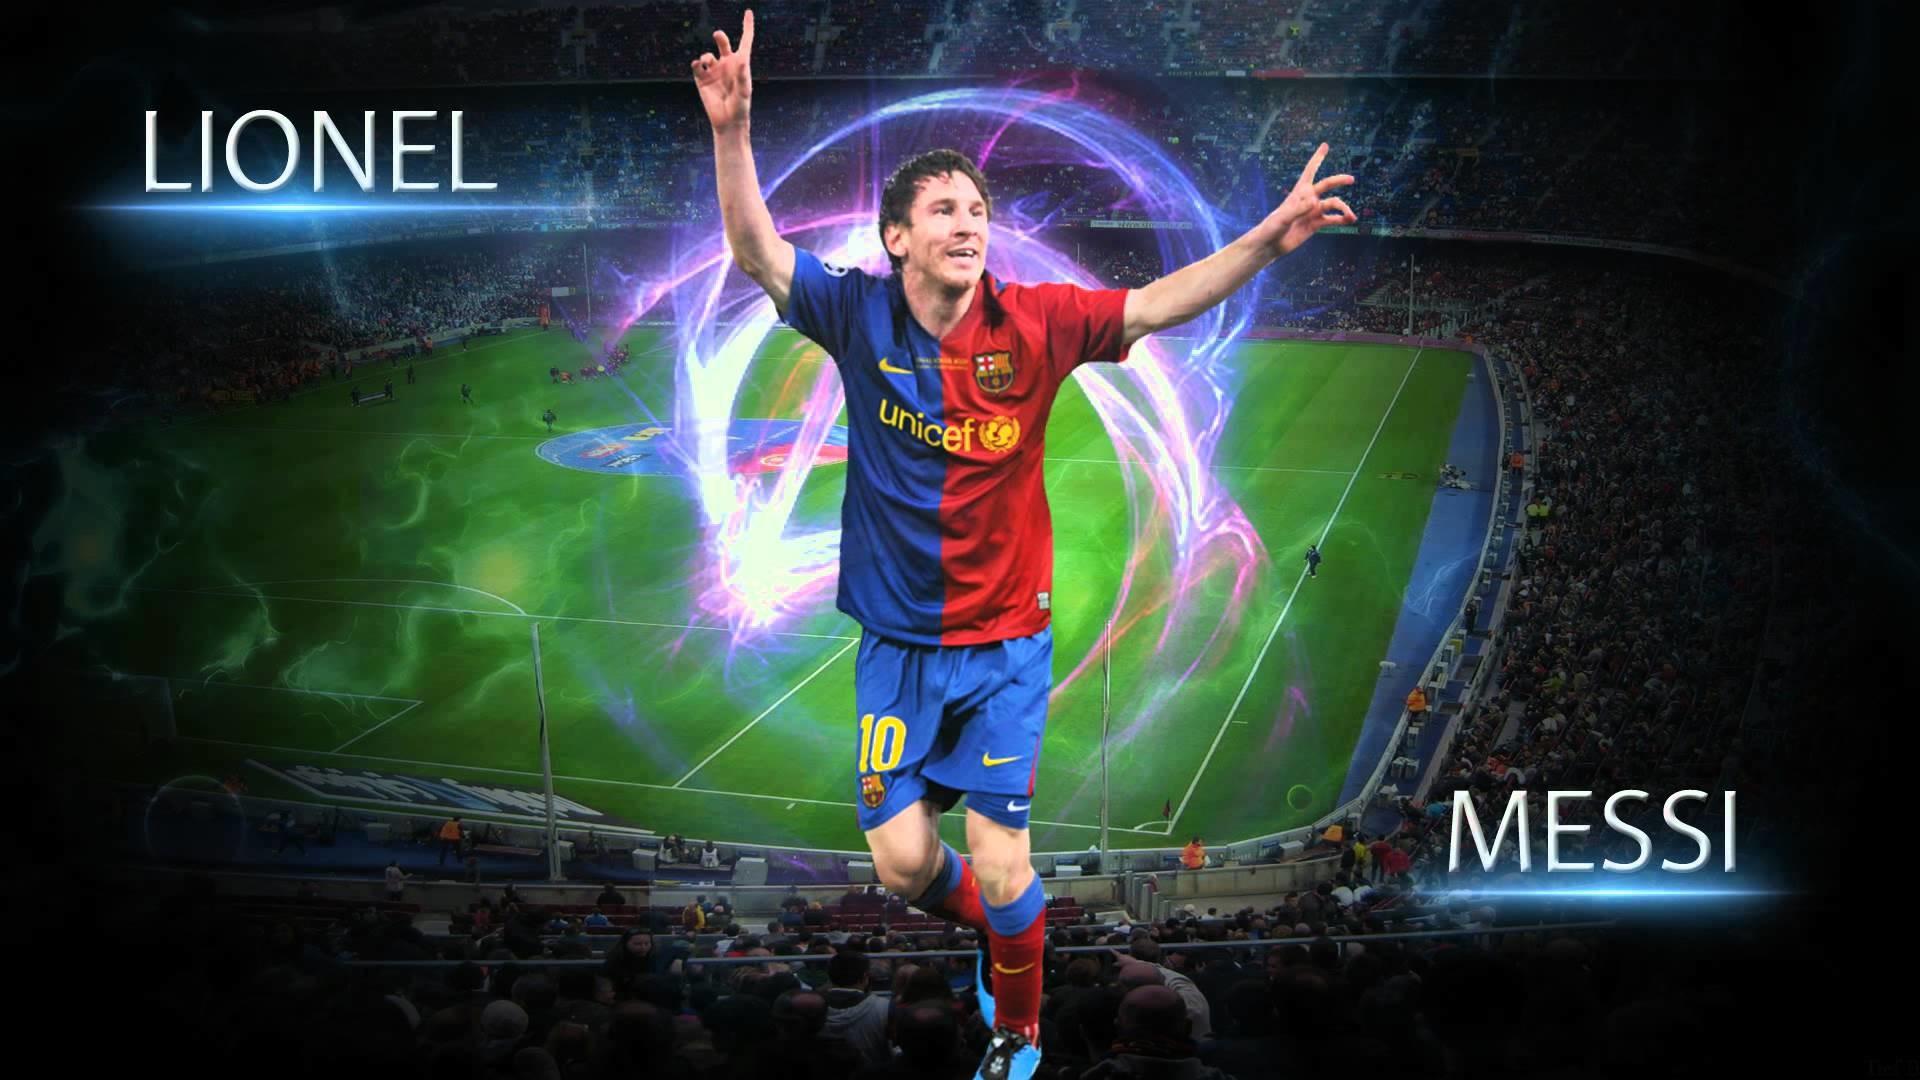 Lionel Messi 2018 Wallpaper HD 1080p 71 Images